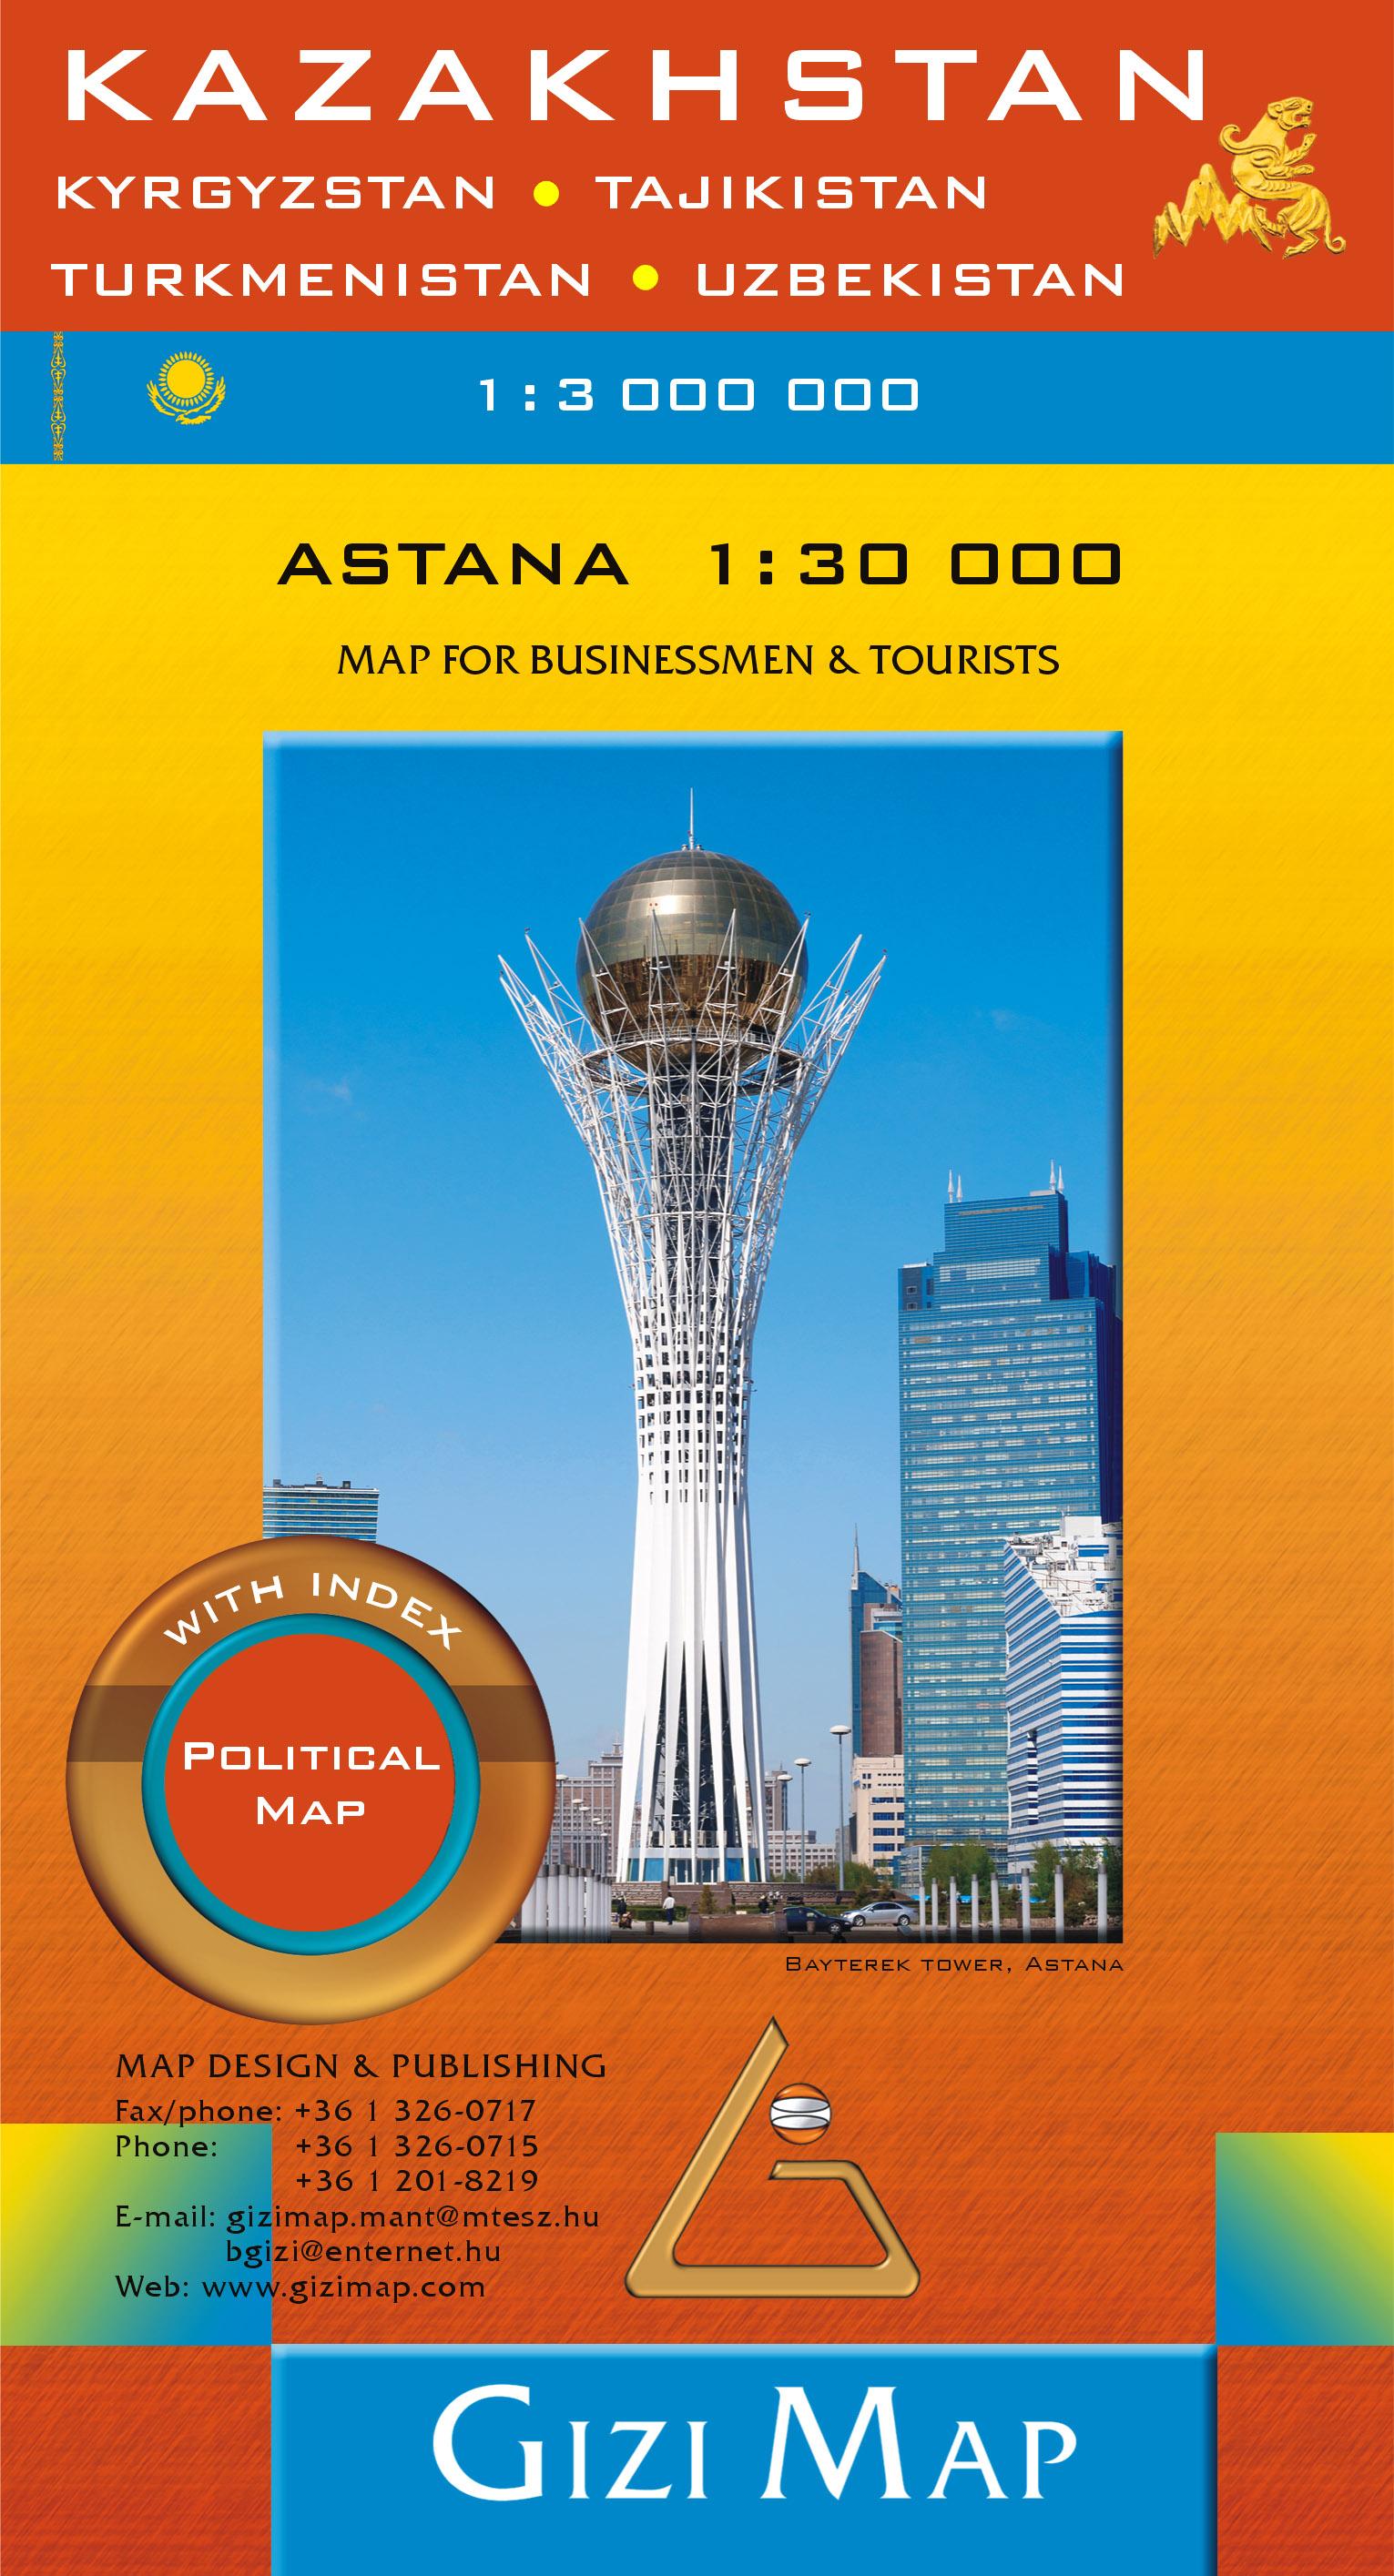 Inset map: Astana. Including also Kyrgyzstan, Uzbekistan, Turkmenistan, Tajikistan